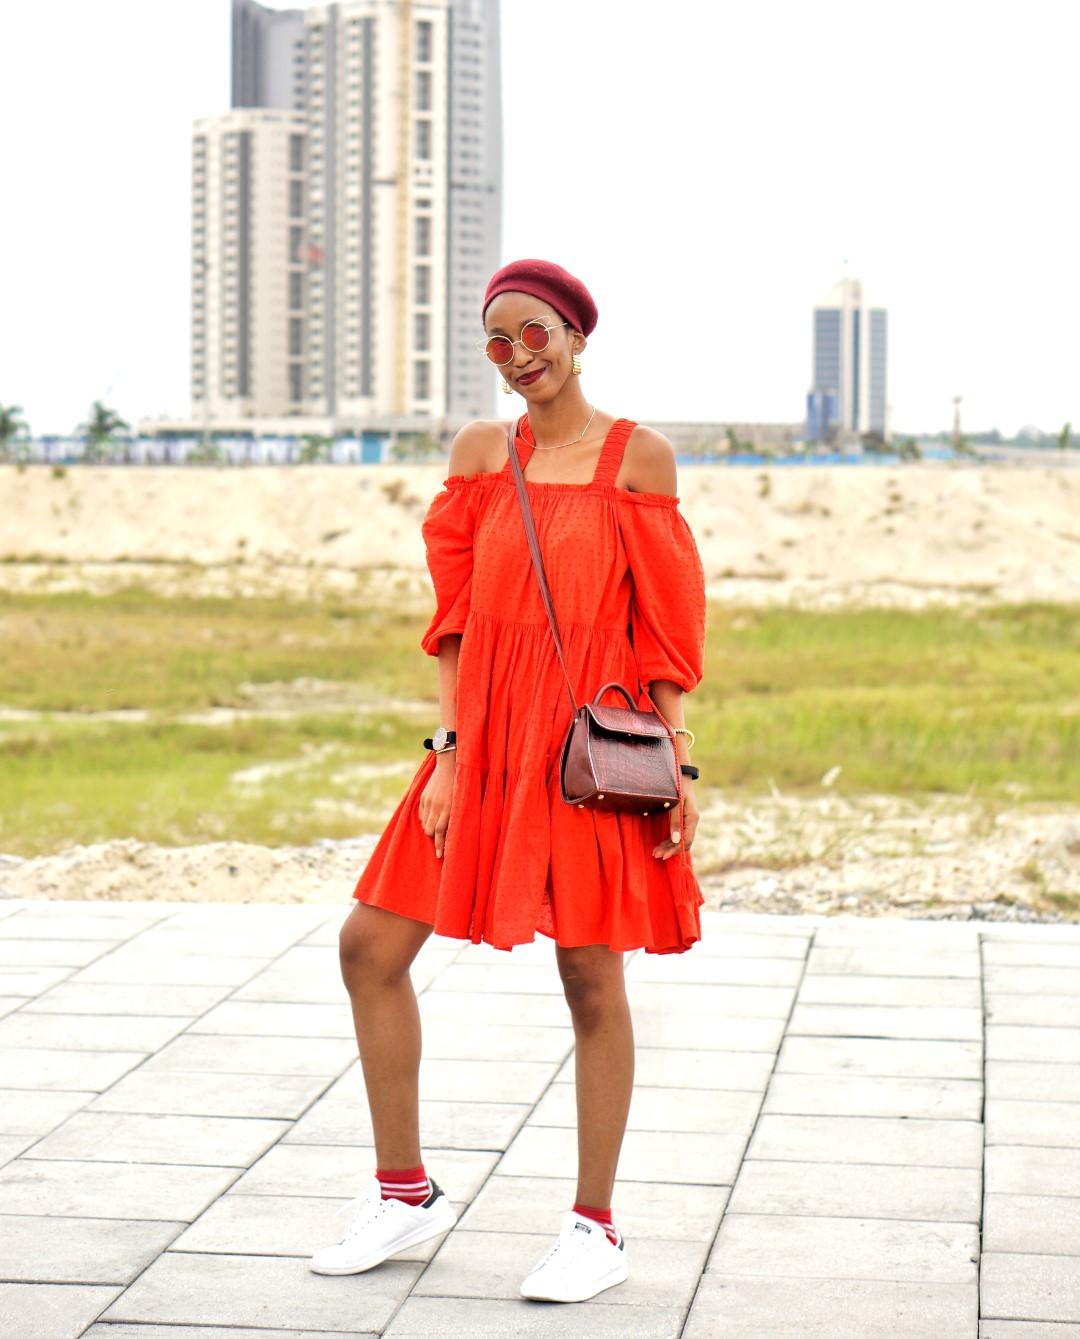 Beret fashion trend